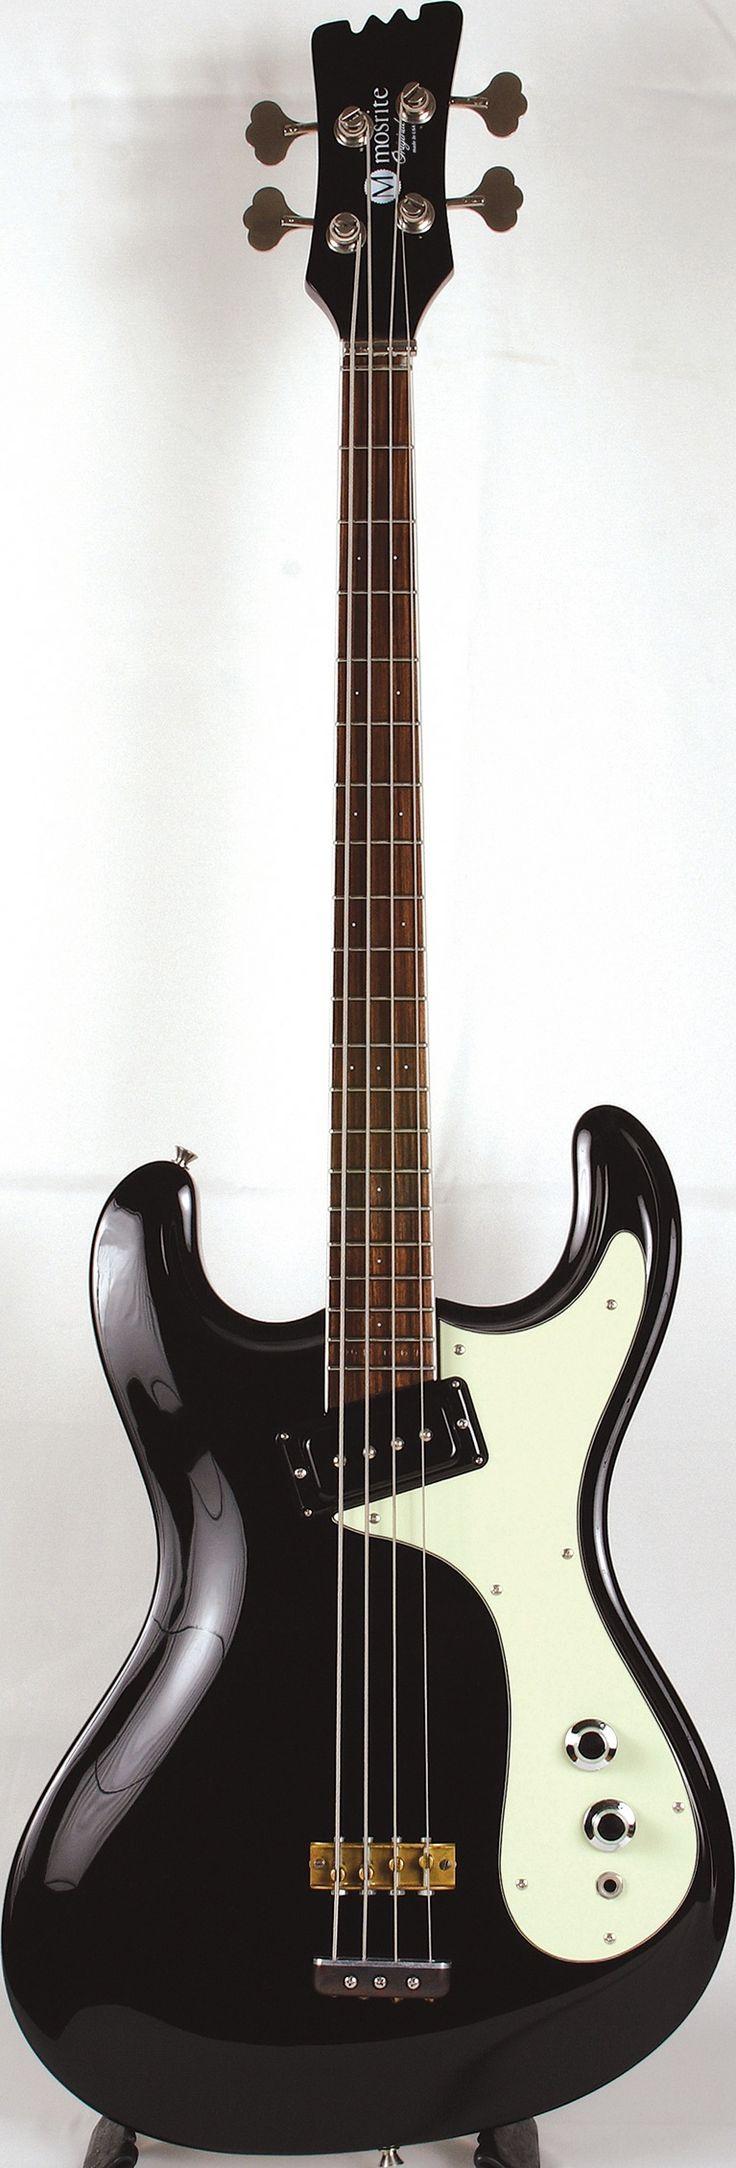 Mosrite Bass